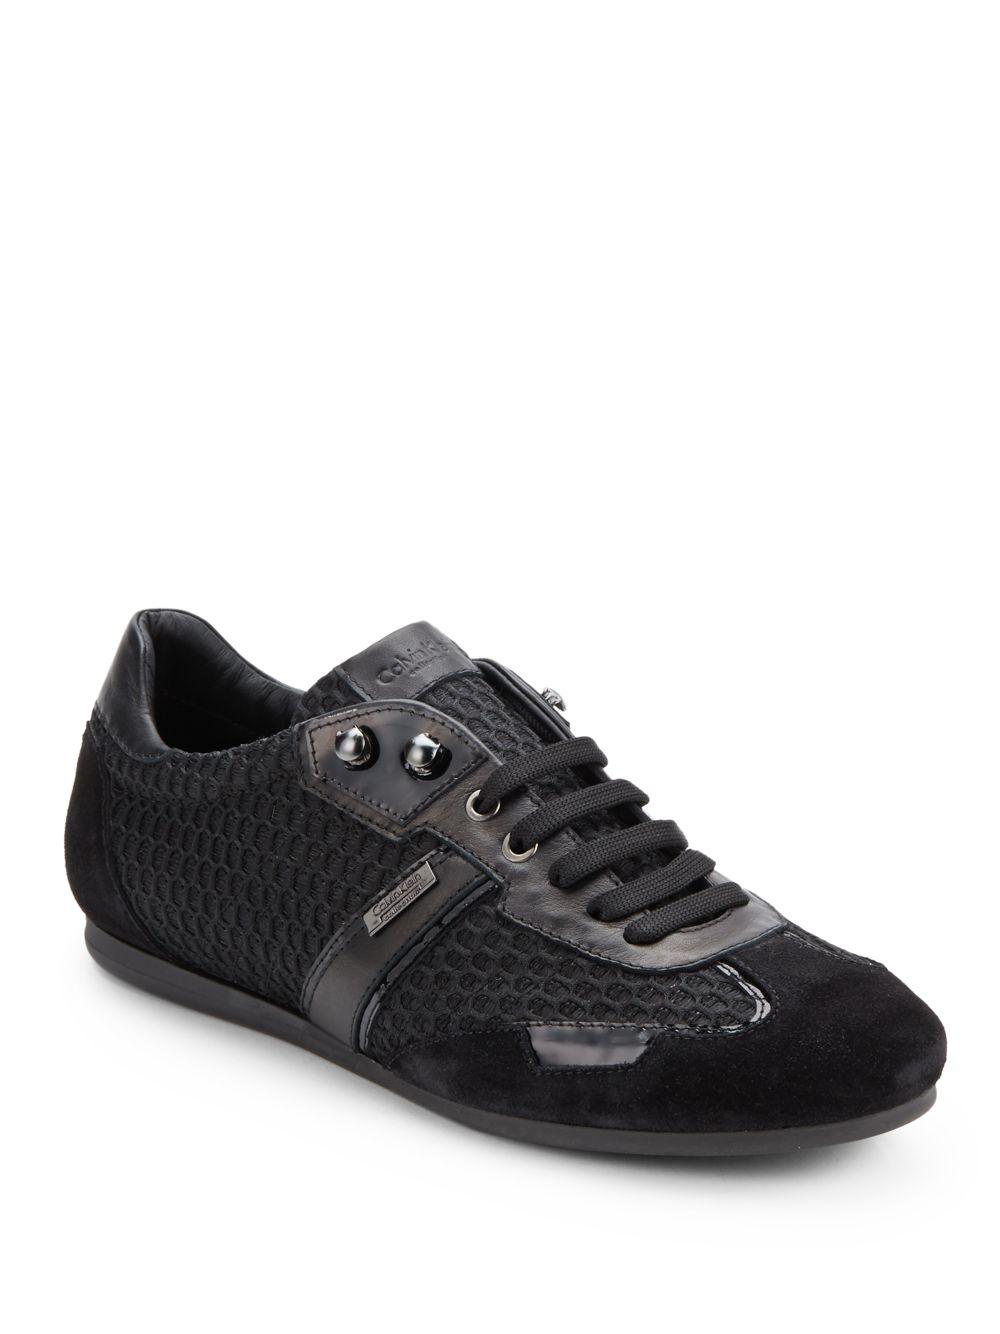 Lyst Calvin Klein Mixedmedia Laceup Sneakers In Black